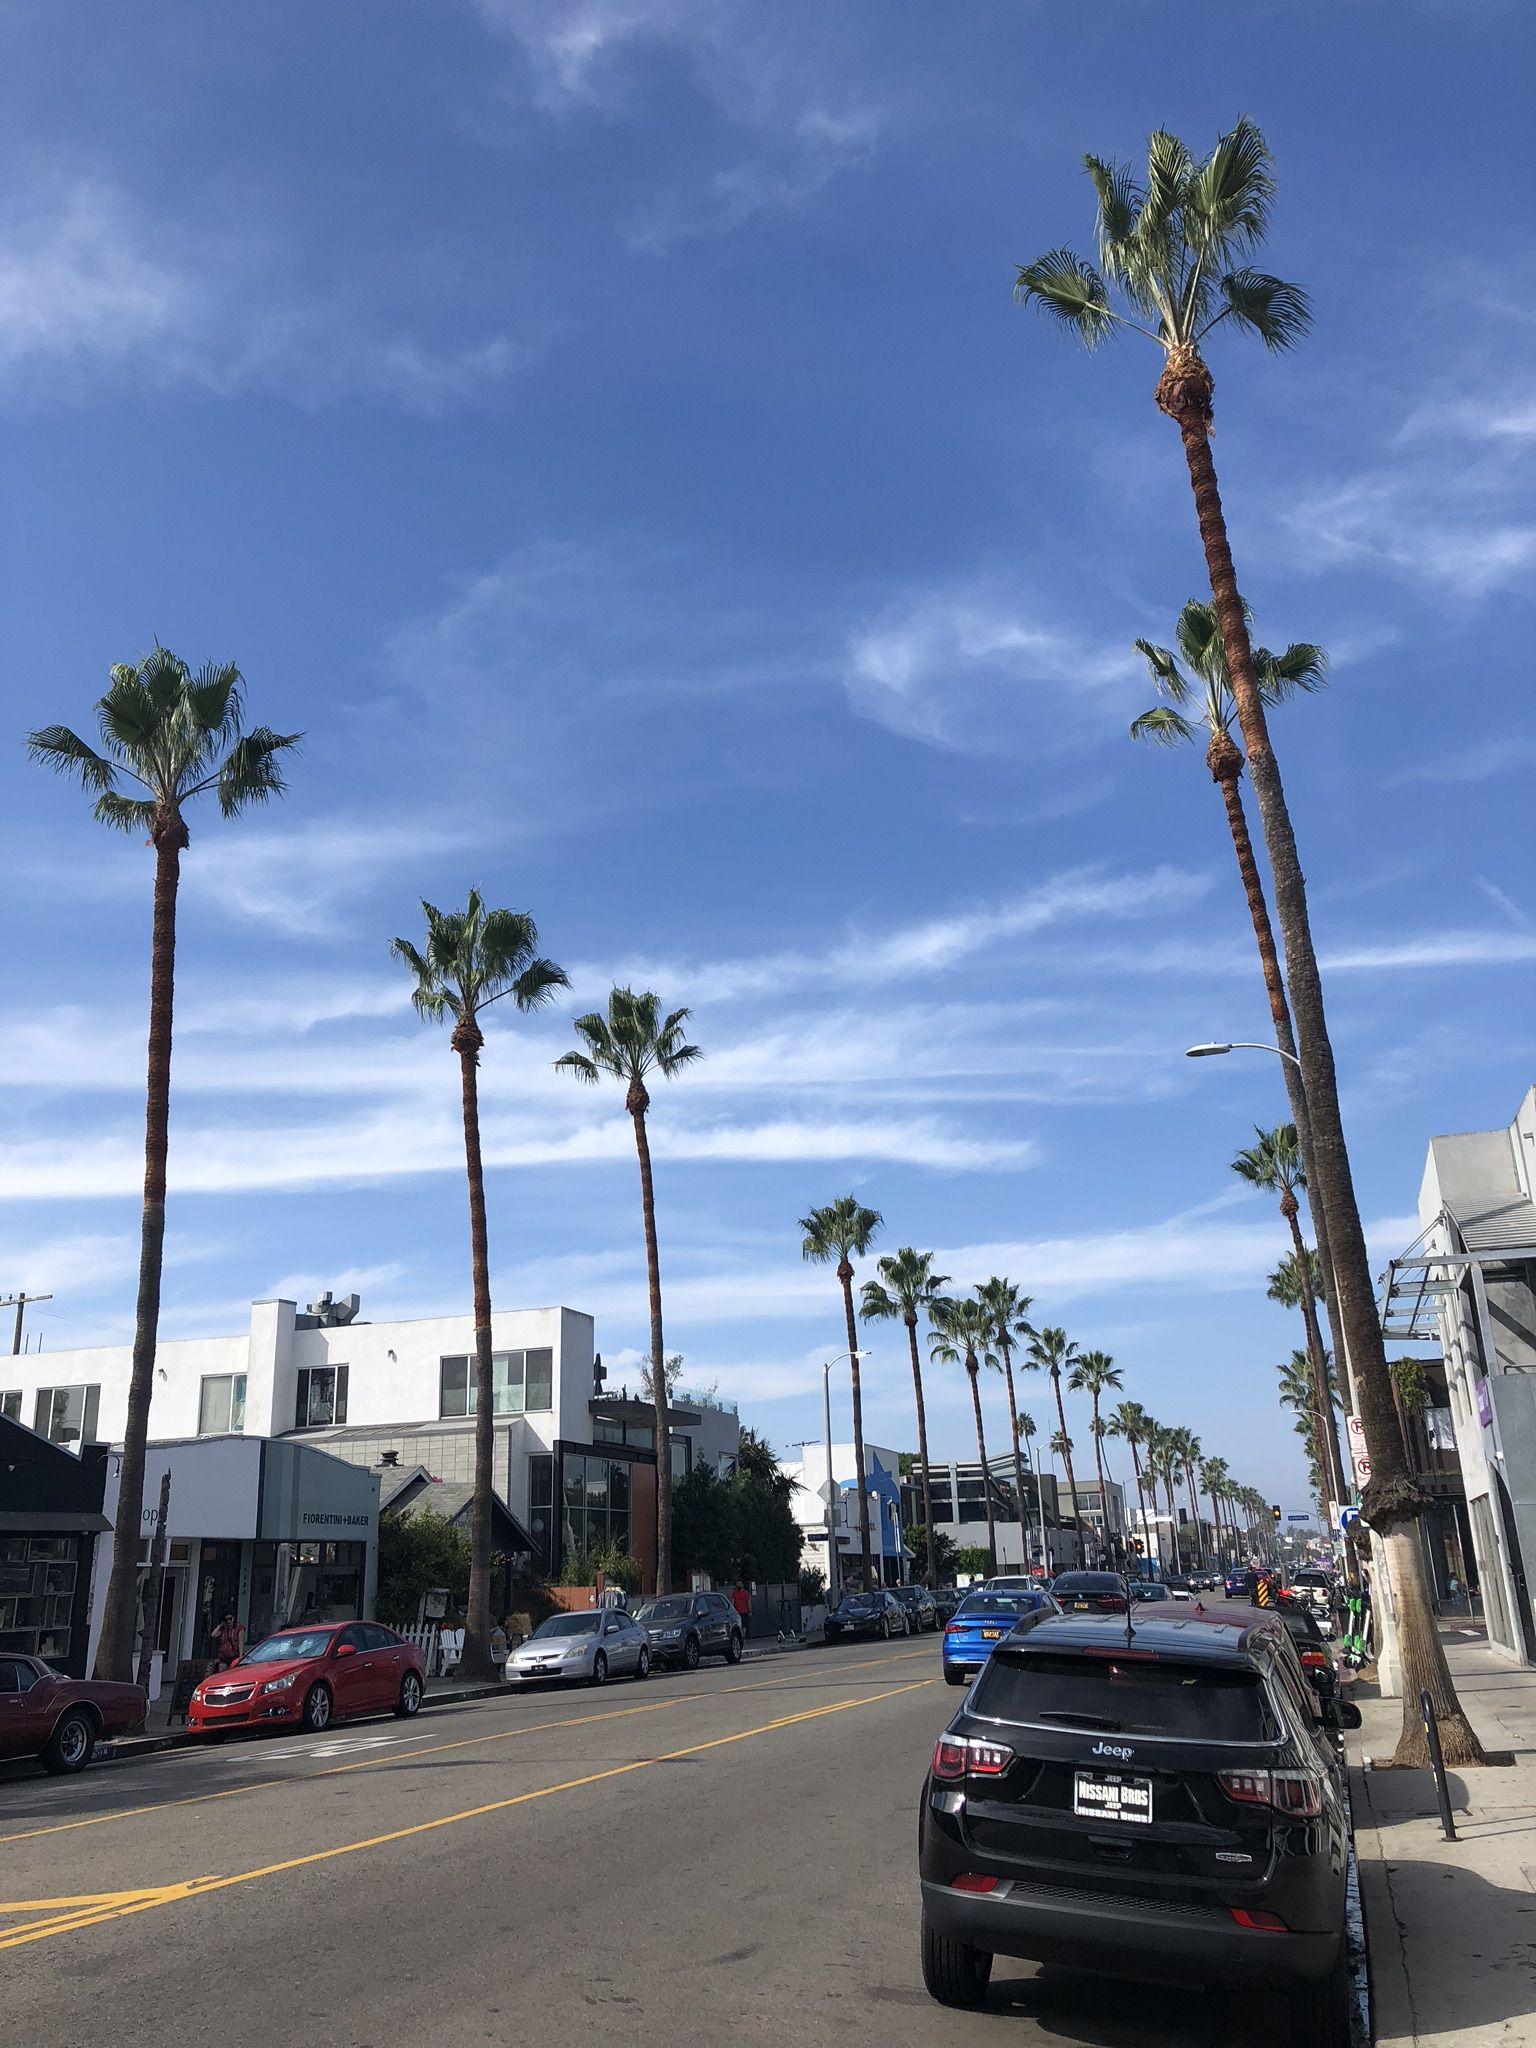 Abbot Kinney Boulevard Los Angeles Venice Beach Los Angeles Los Angeles Venice Beach